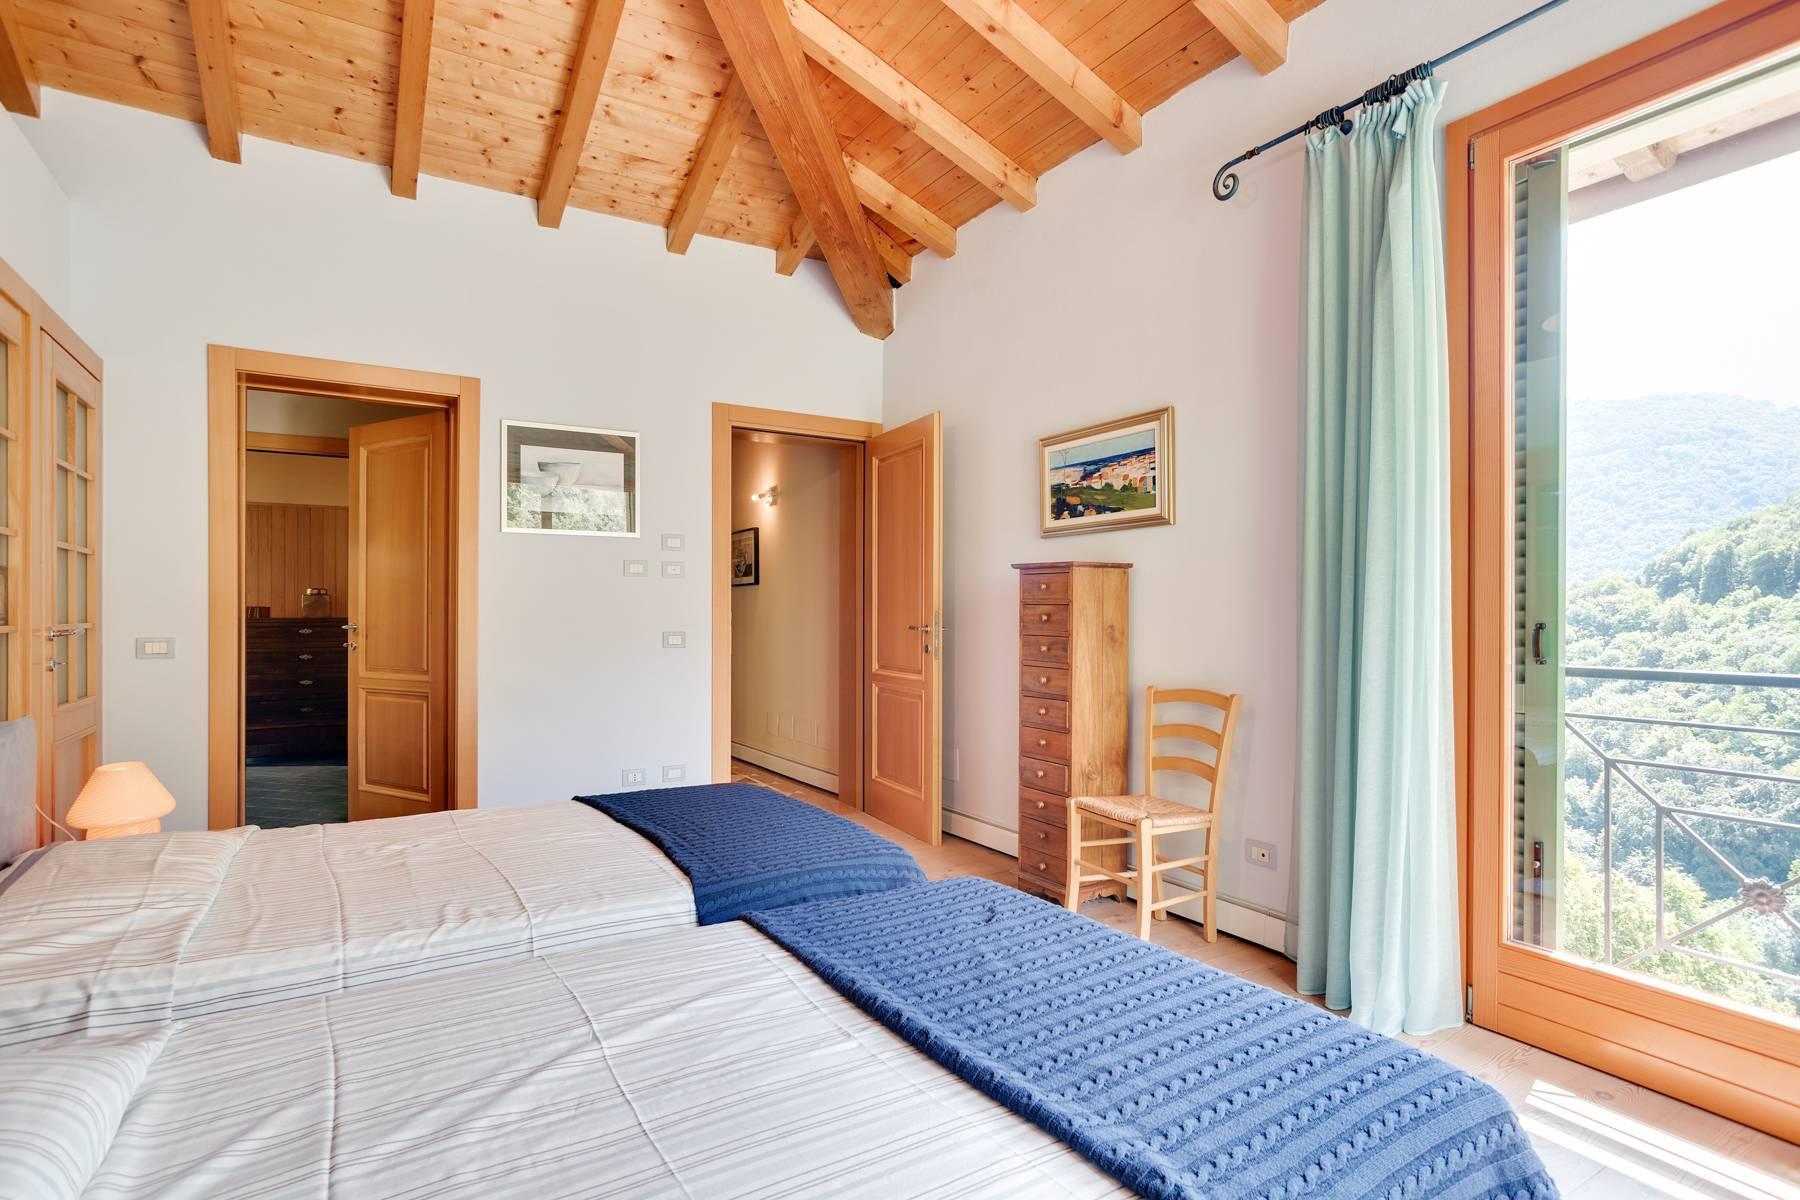 Splendida villa moderna sulla collina soleggiata sopra Argegno - 25